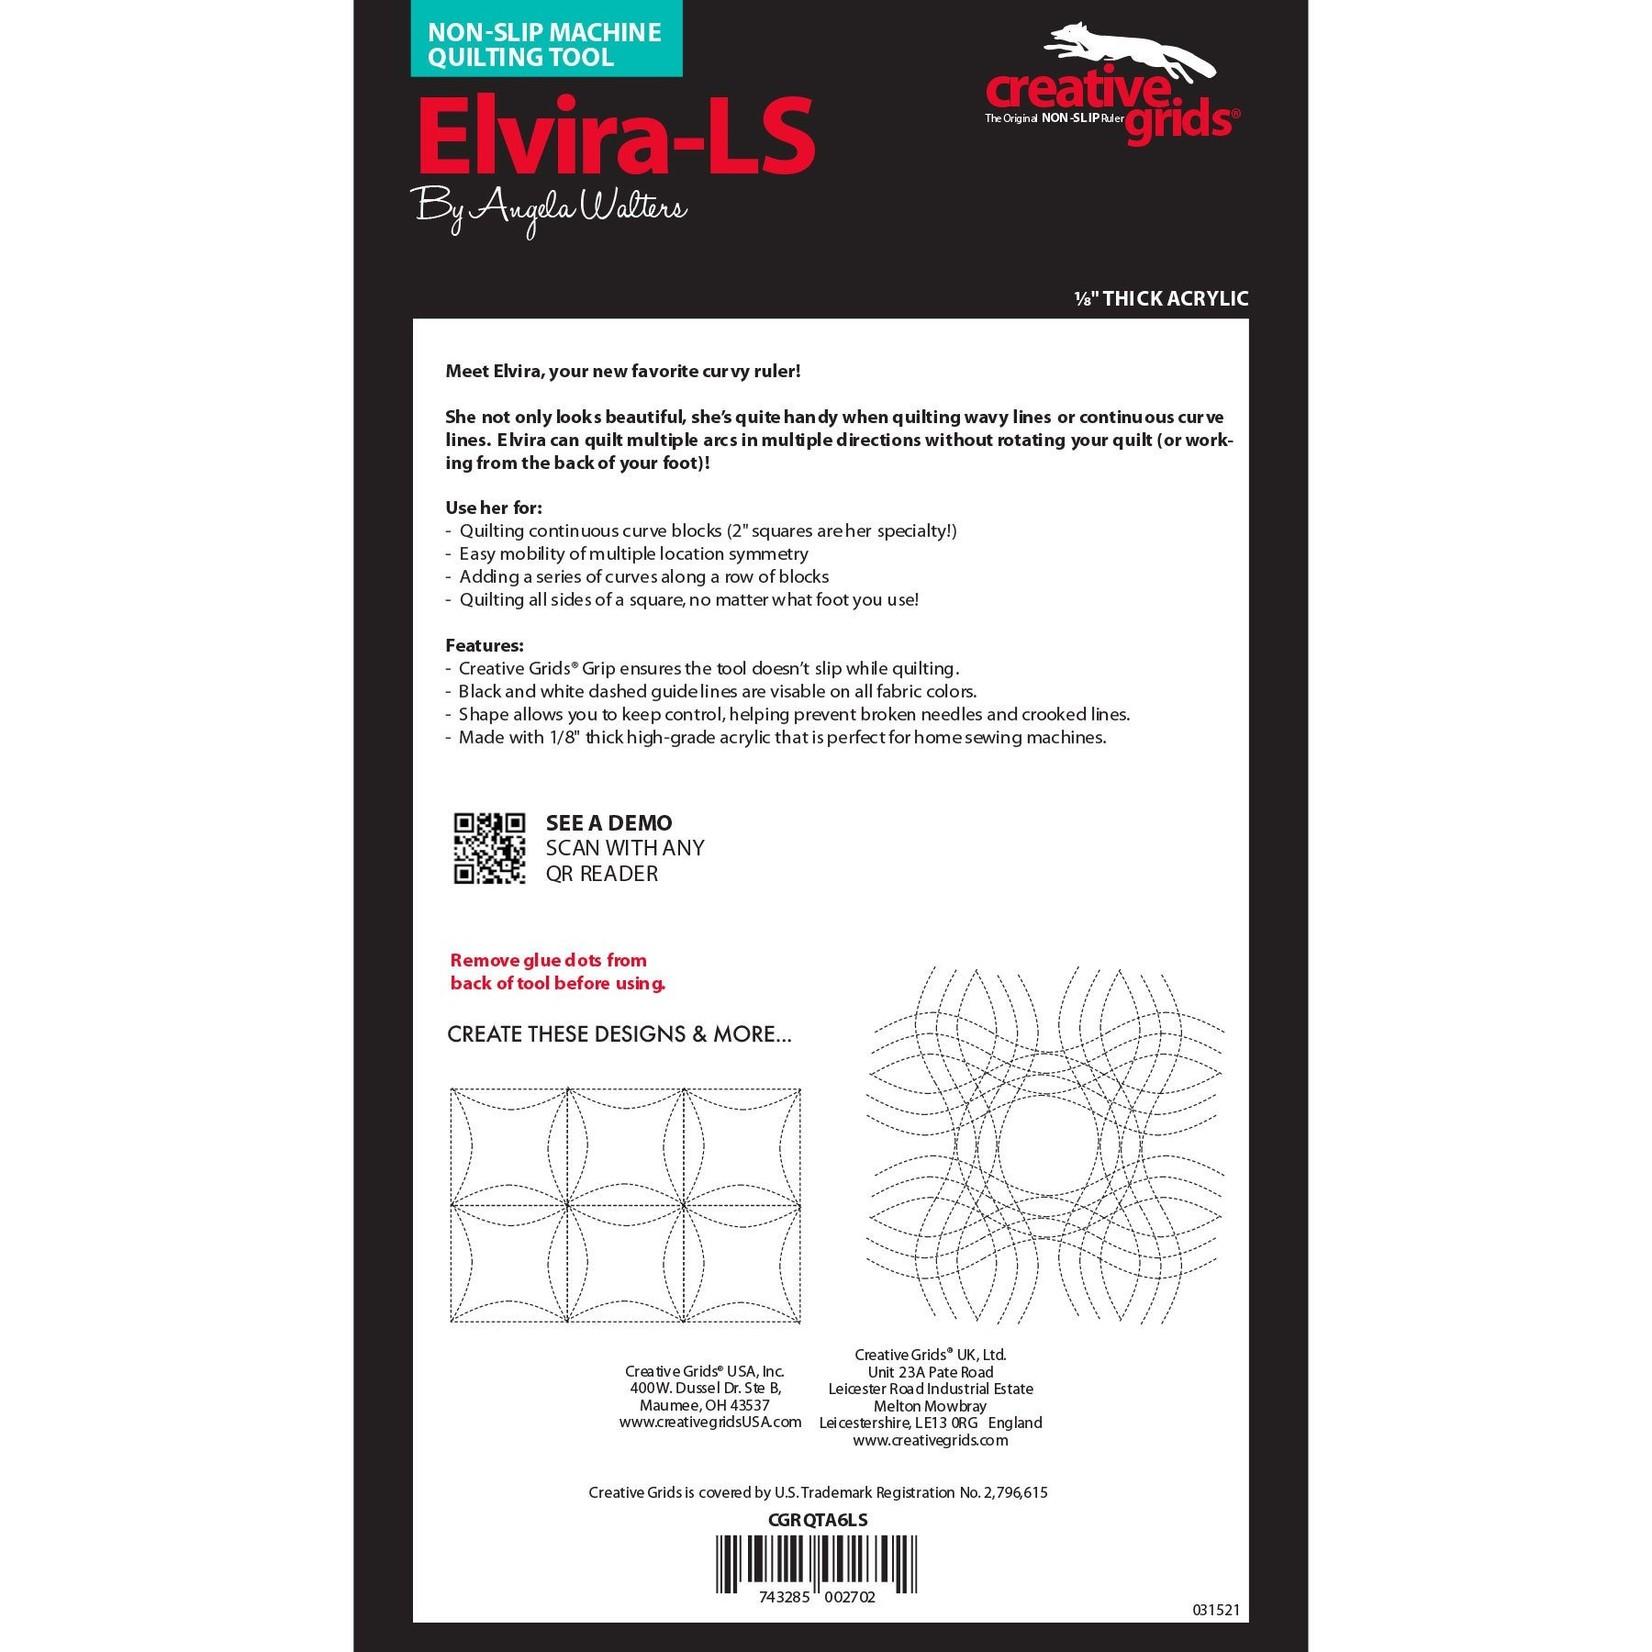 Creative Grids Creative Grids Elvira Low Shank CGRQTA6 LS